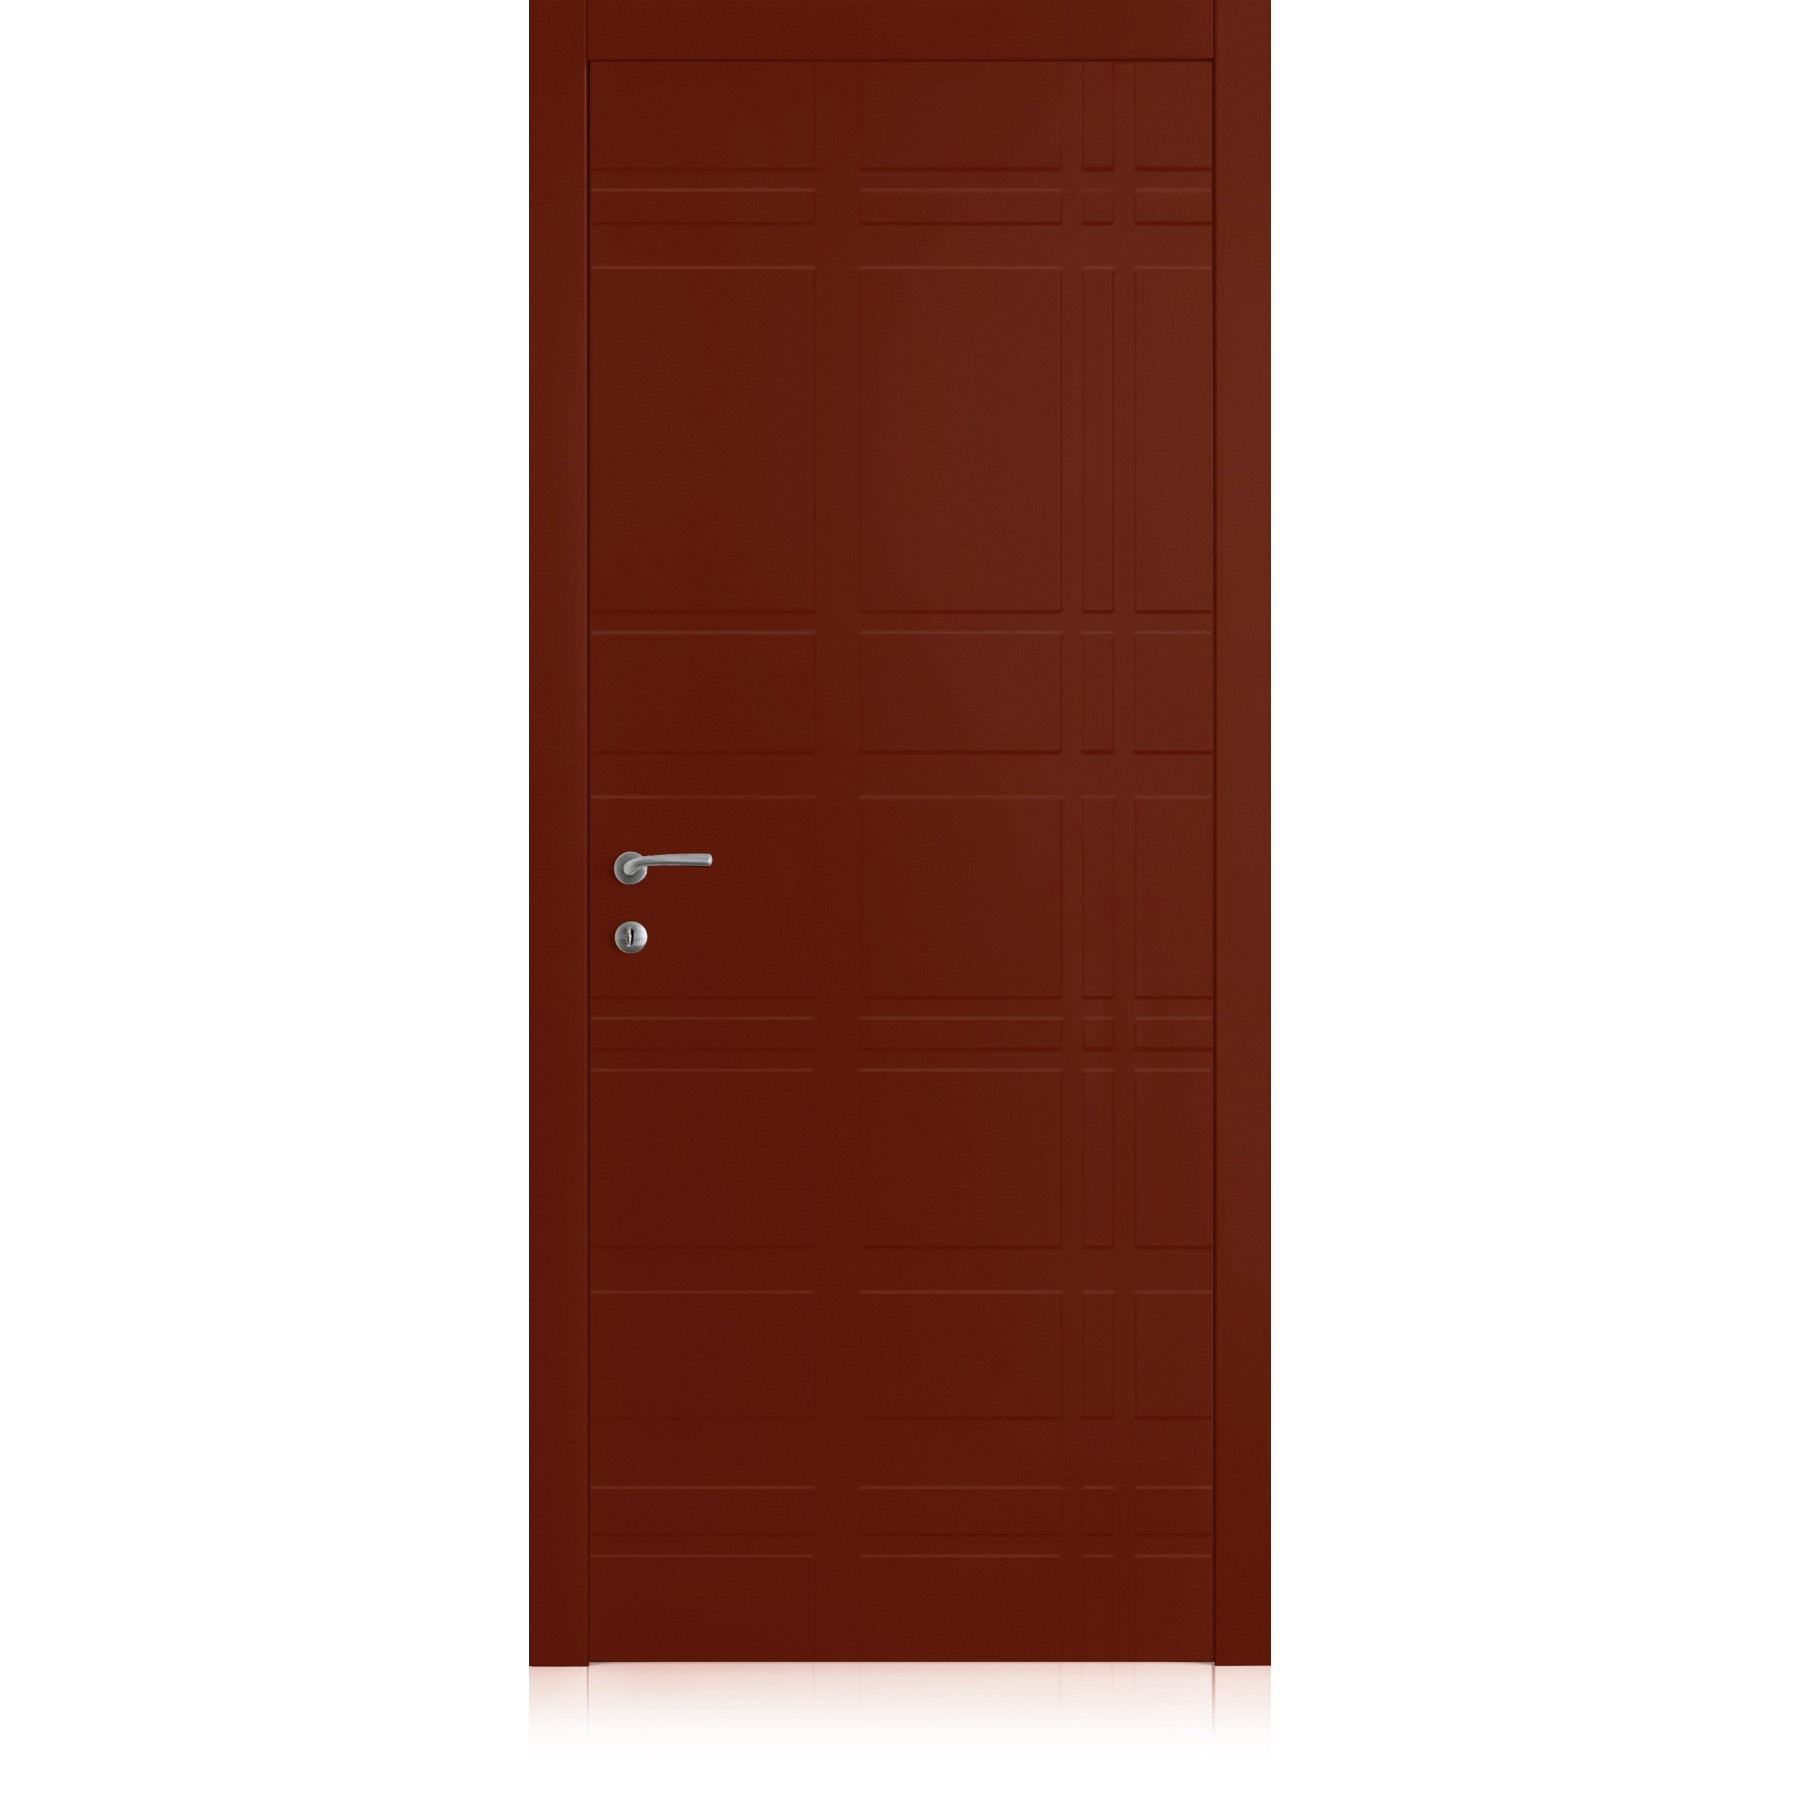 Yncisa Tartan Corallo Pure Laccato ULTRAopaco door